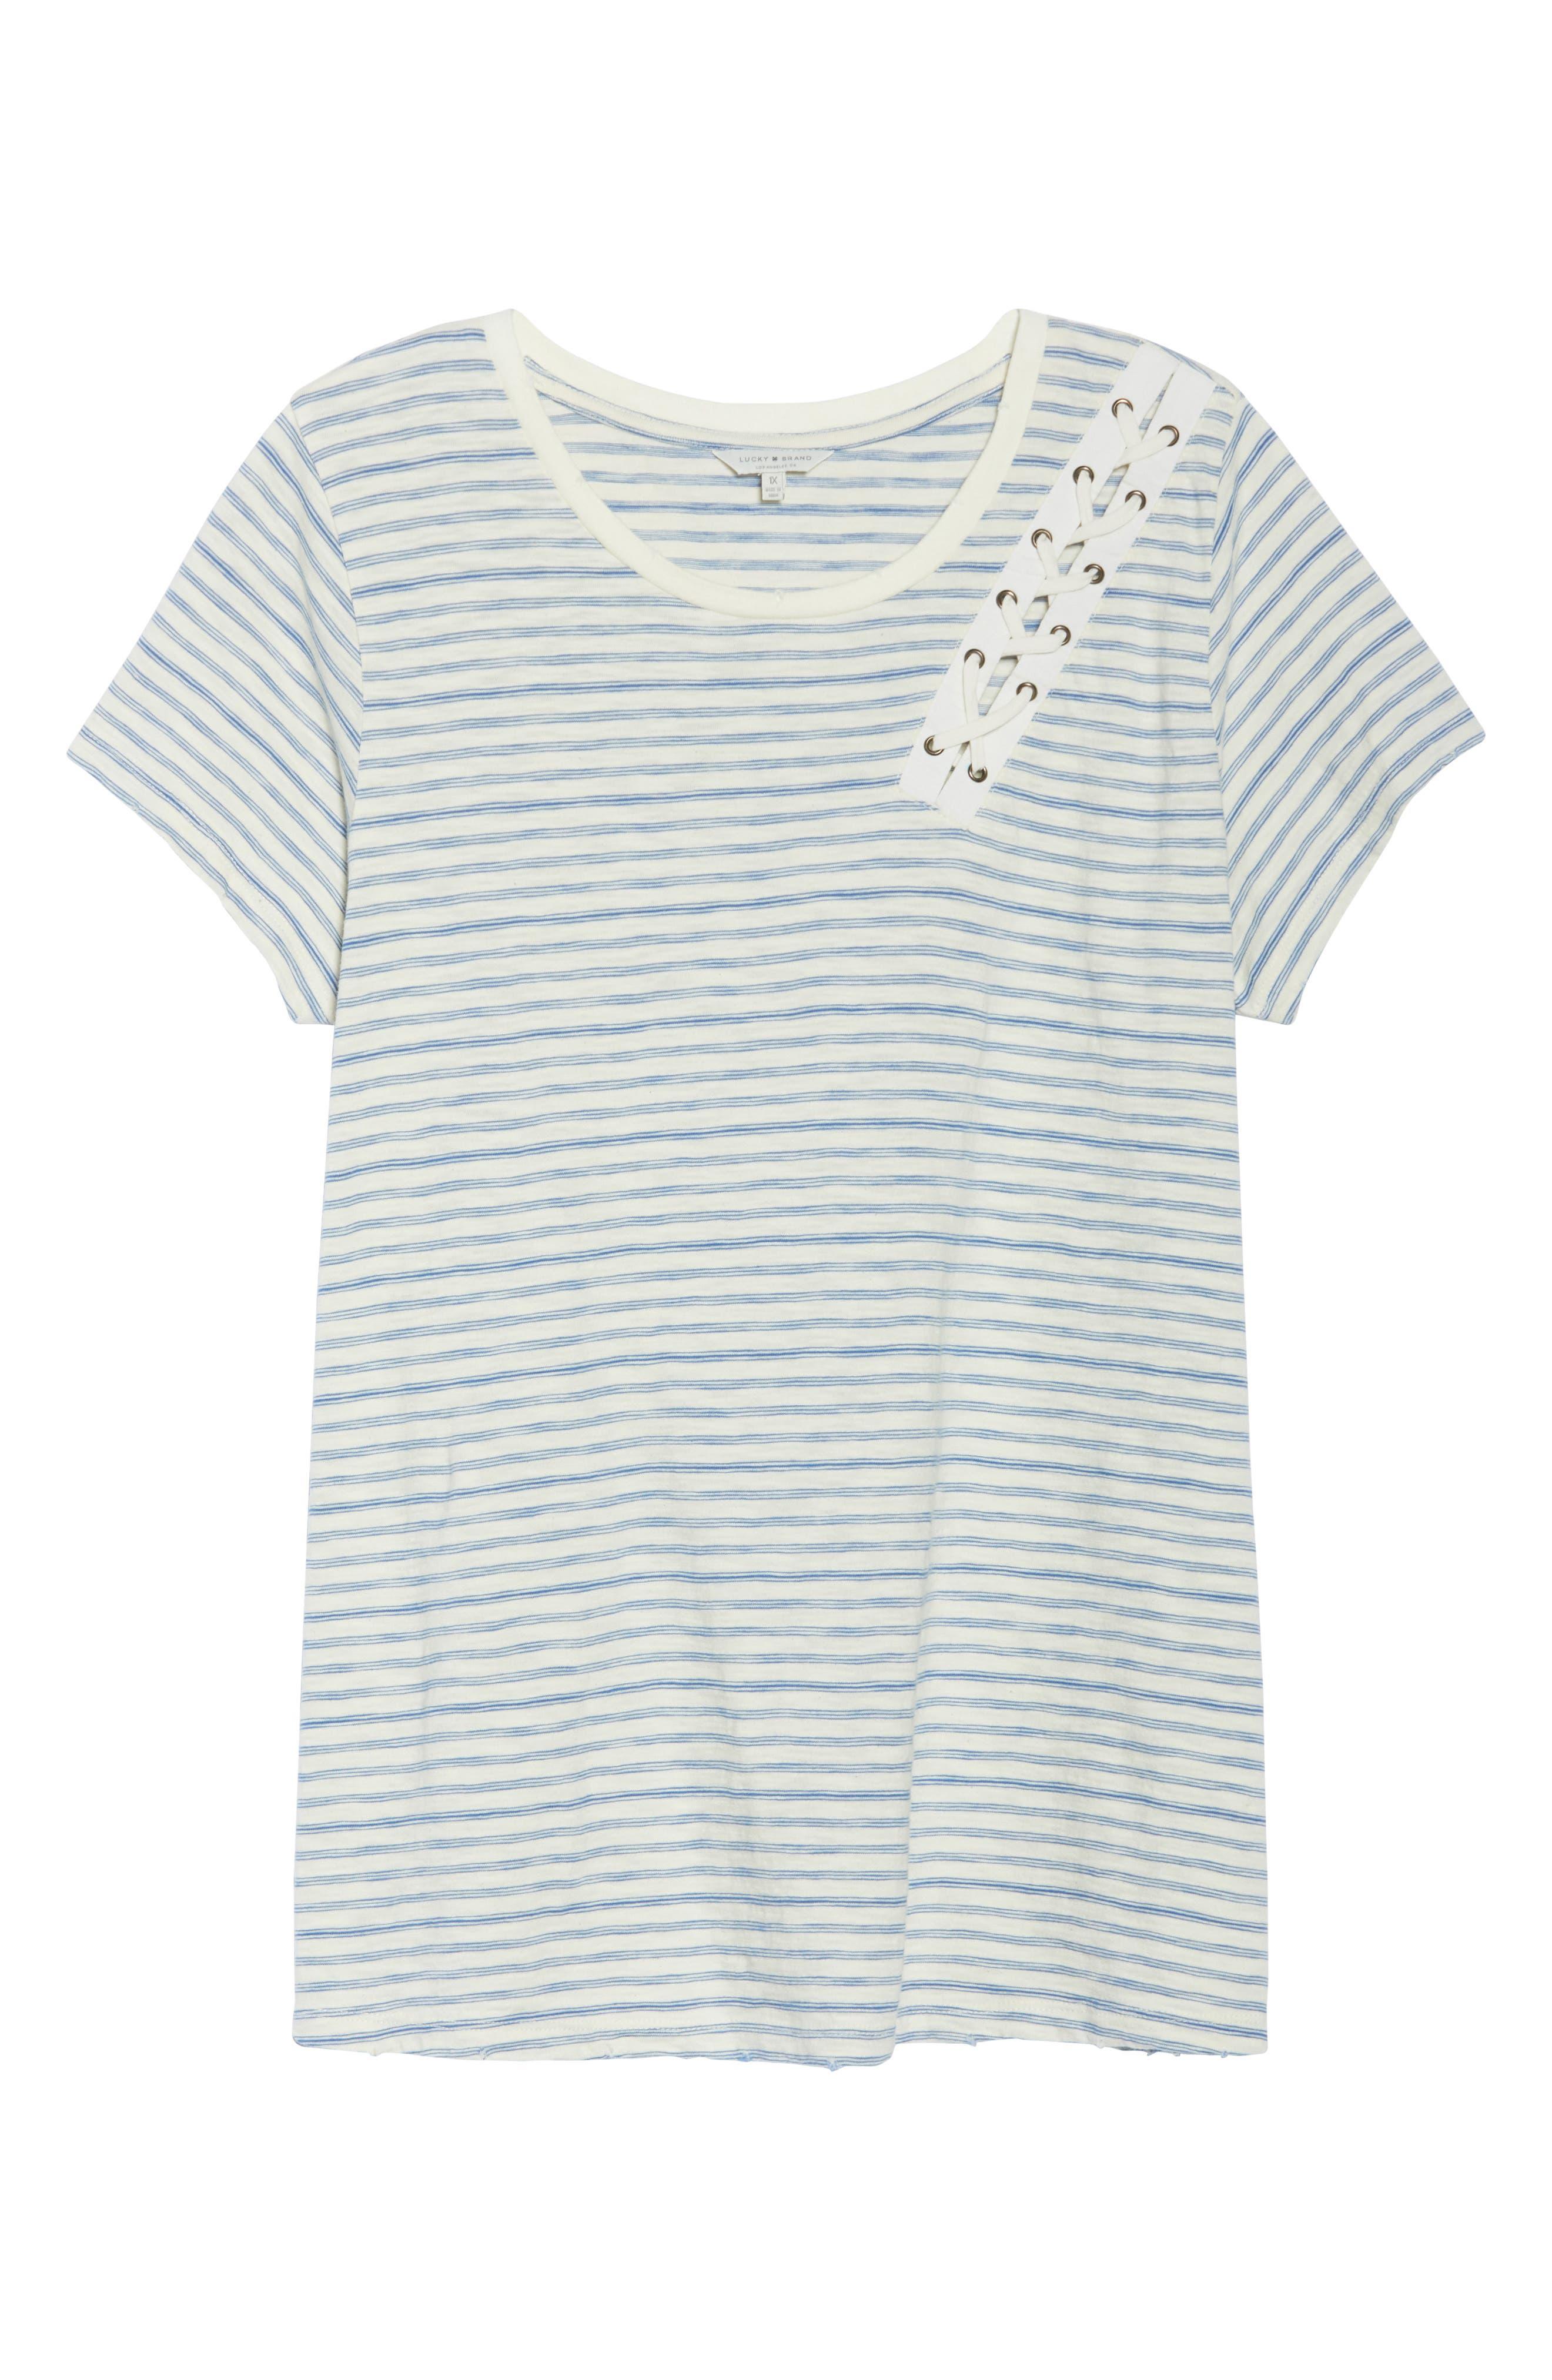 Lace-Up Shoulder Stripe Tee,                             Alternate thumbnail 7, color,                             460